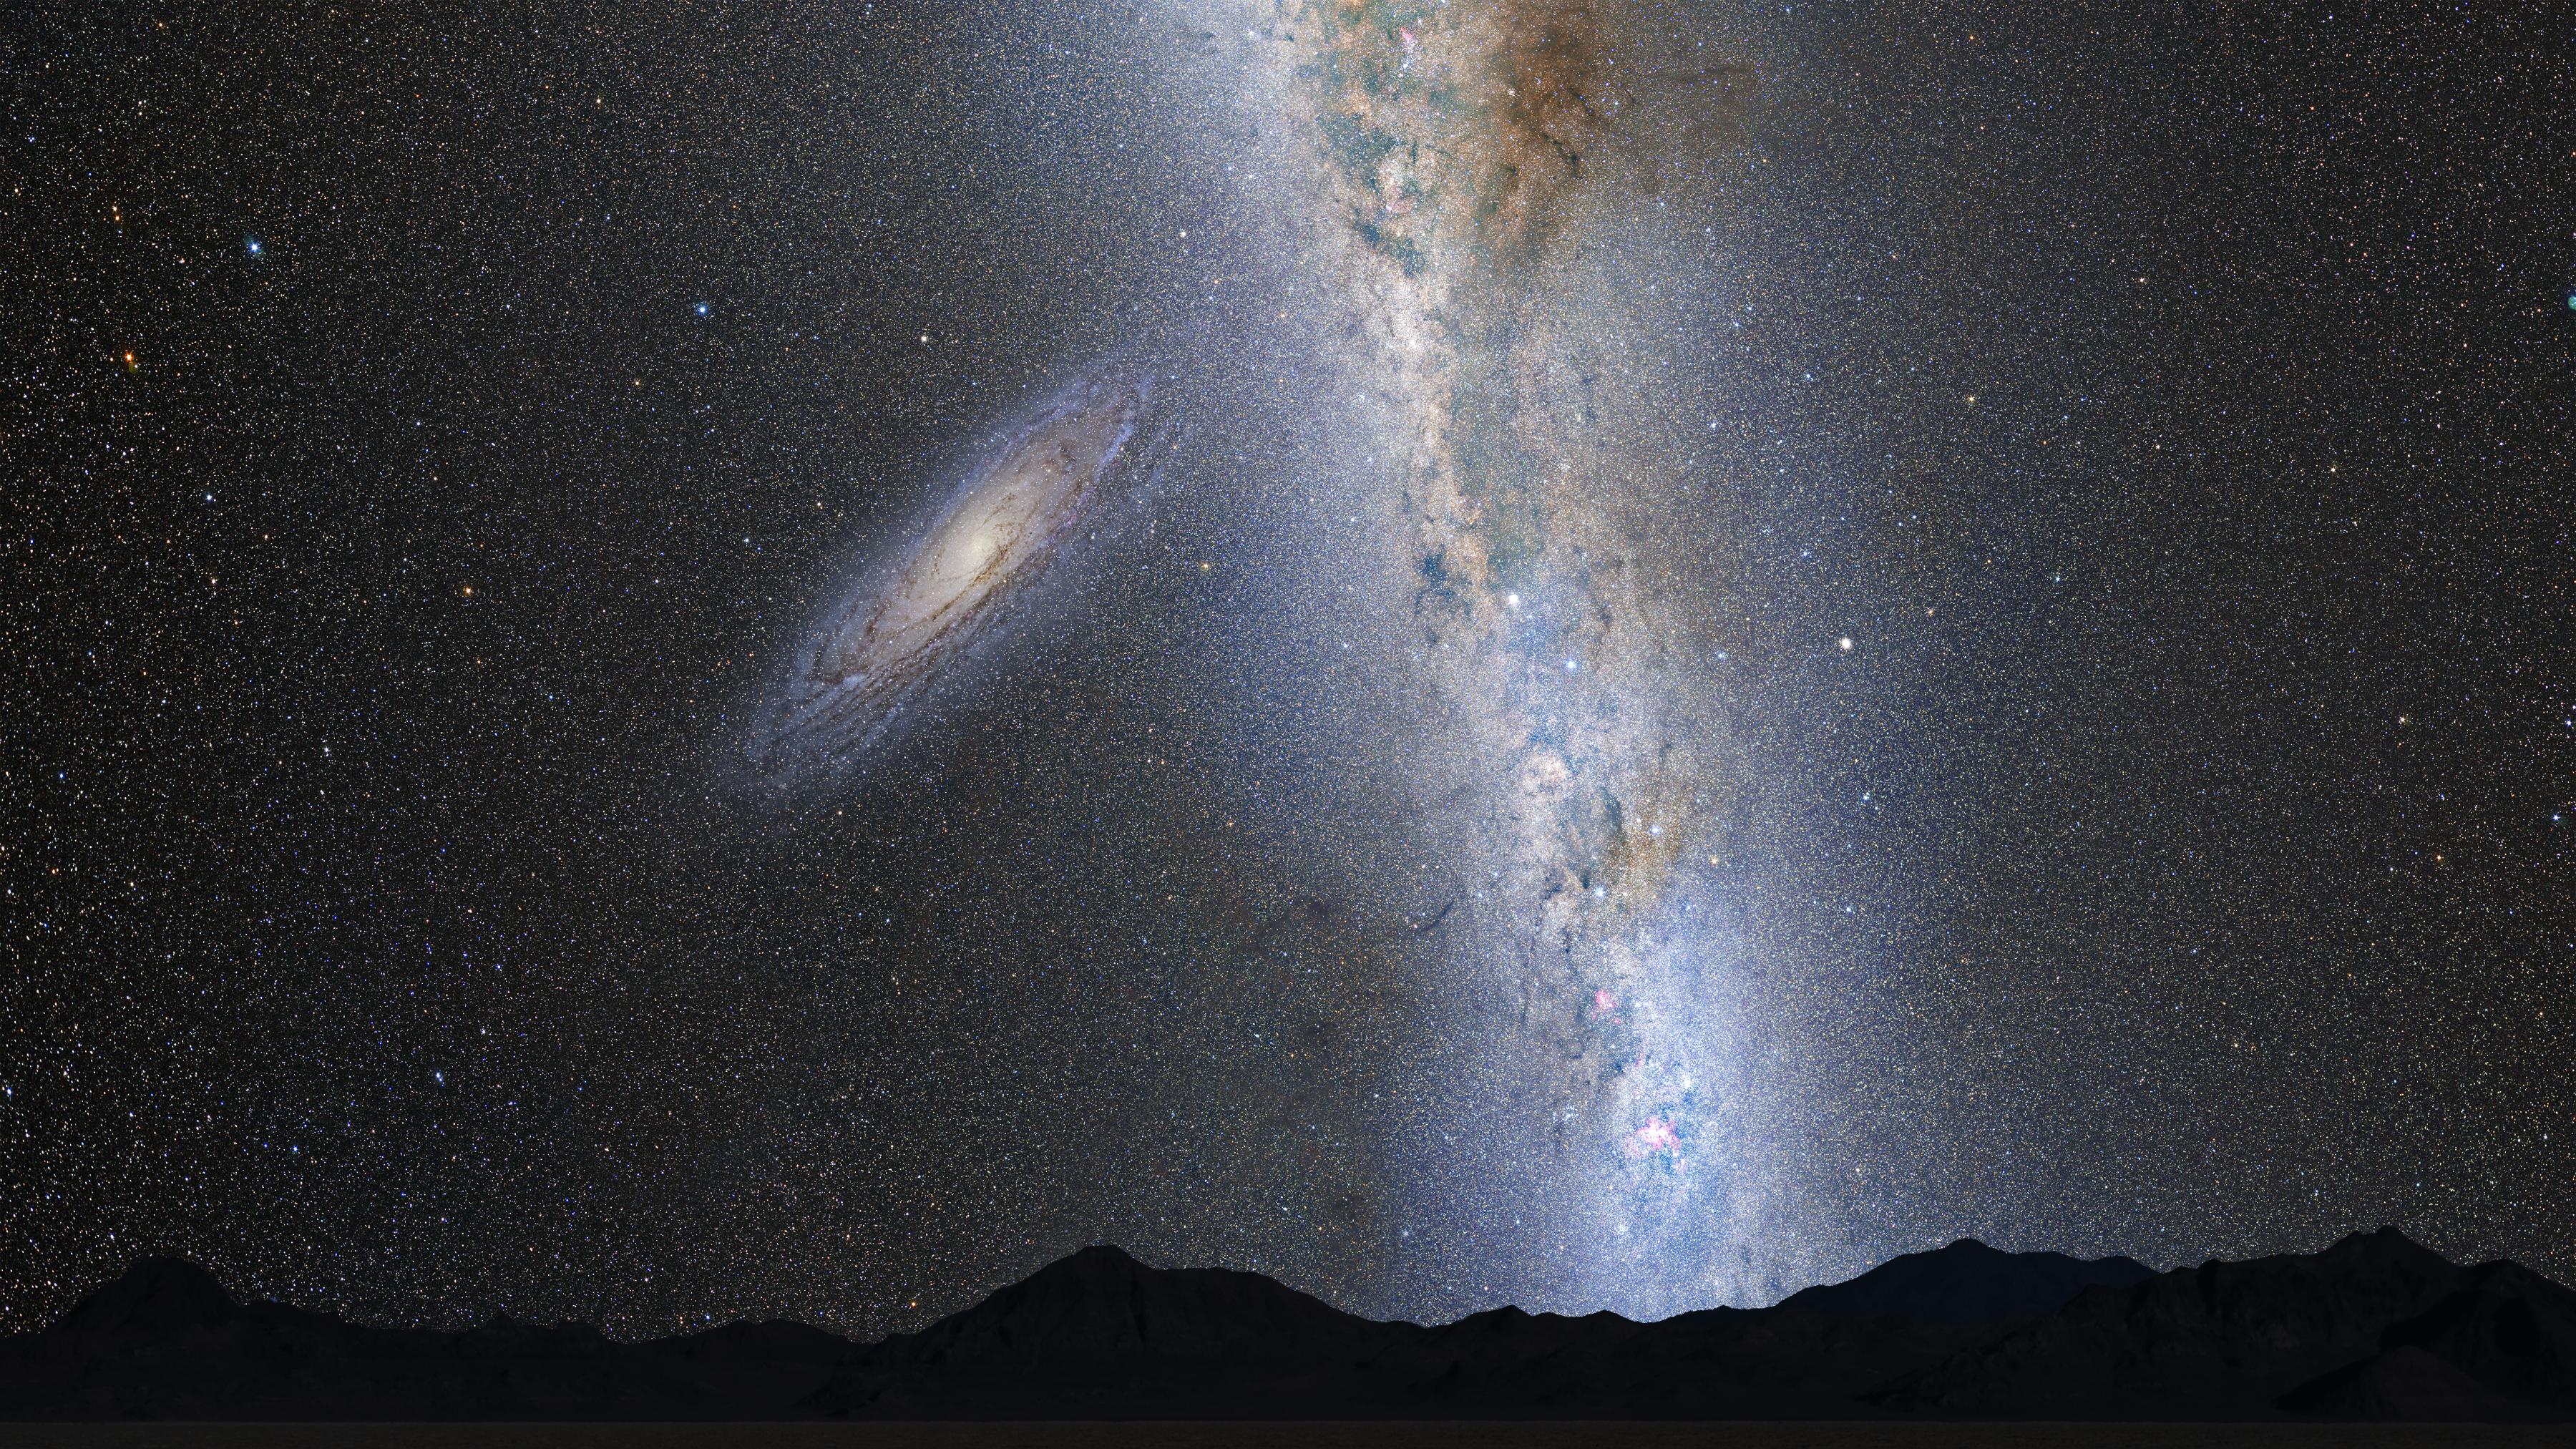 Artist's views of a night sky transformed by a galaxy merger.